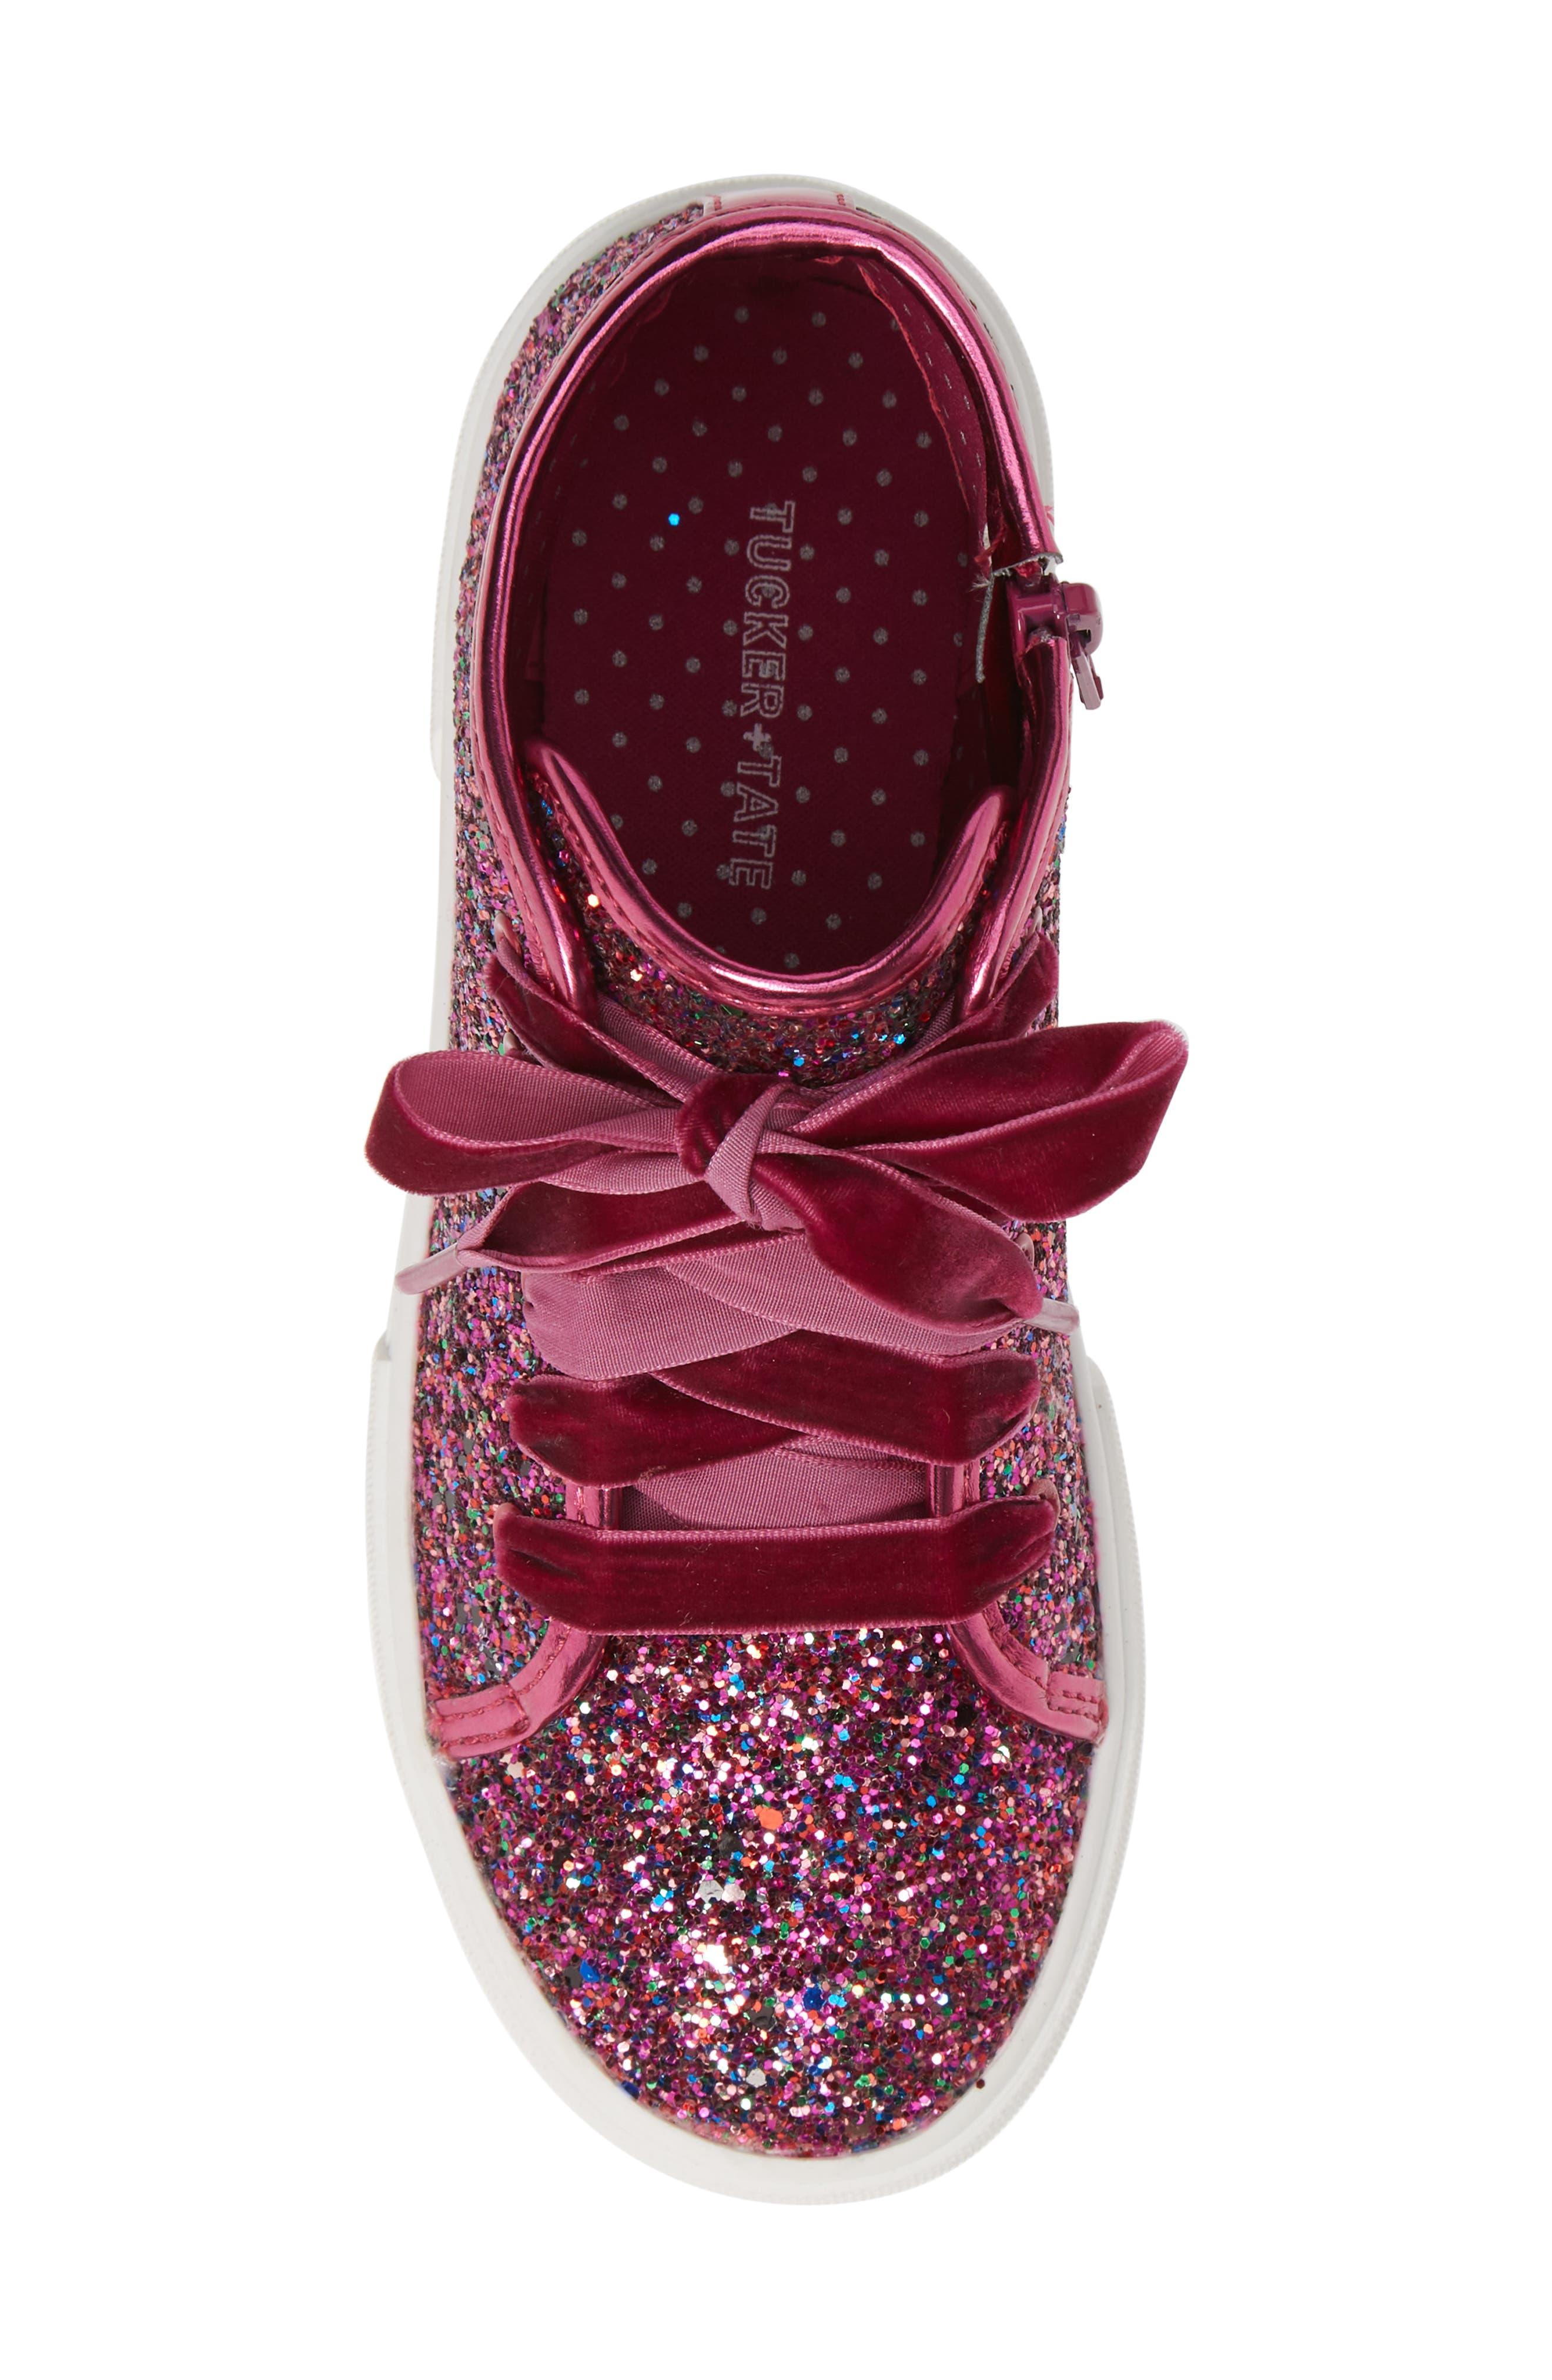 TUCKER + TATE, Skylar Glitter Sneaker, Alternate thumbnail 5, color, FUSCHIA MULTI GLITTER PU